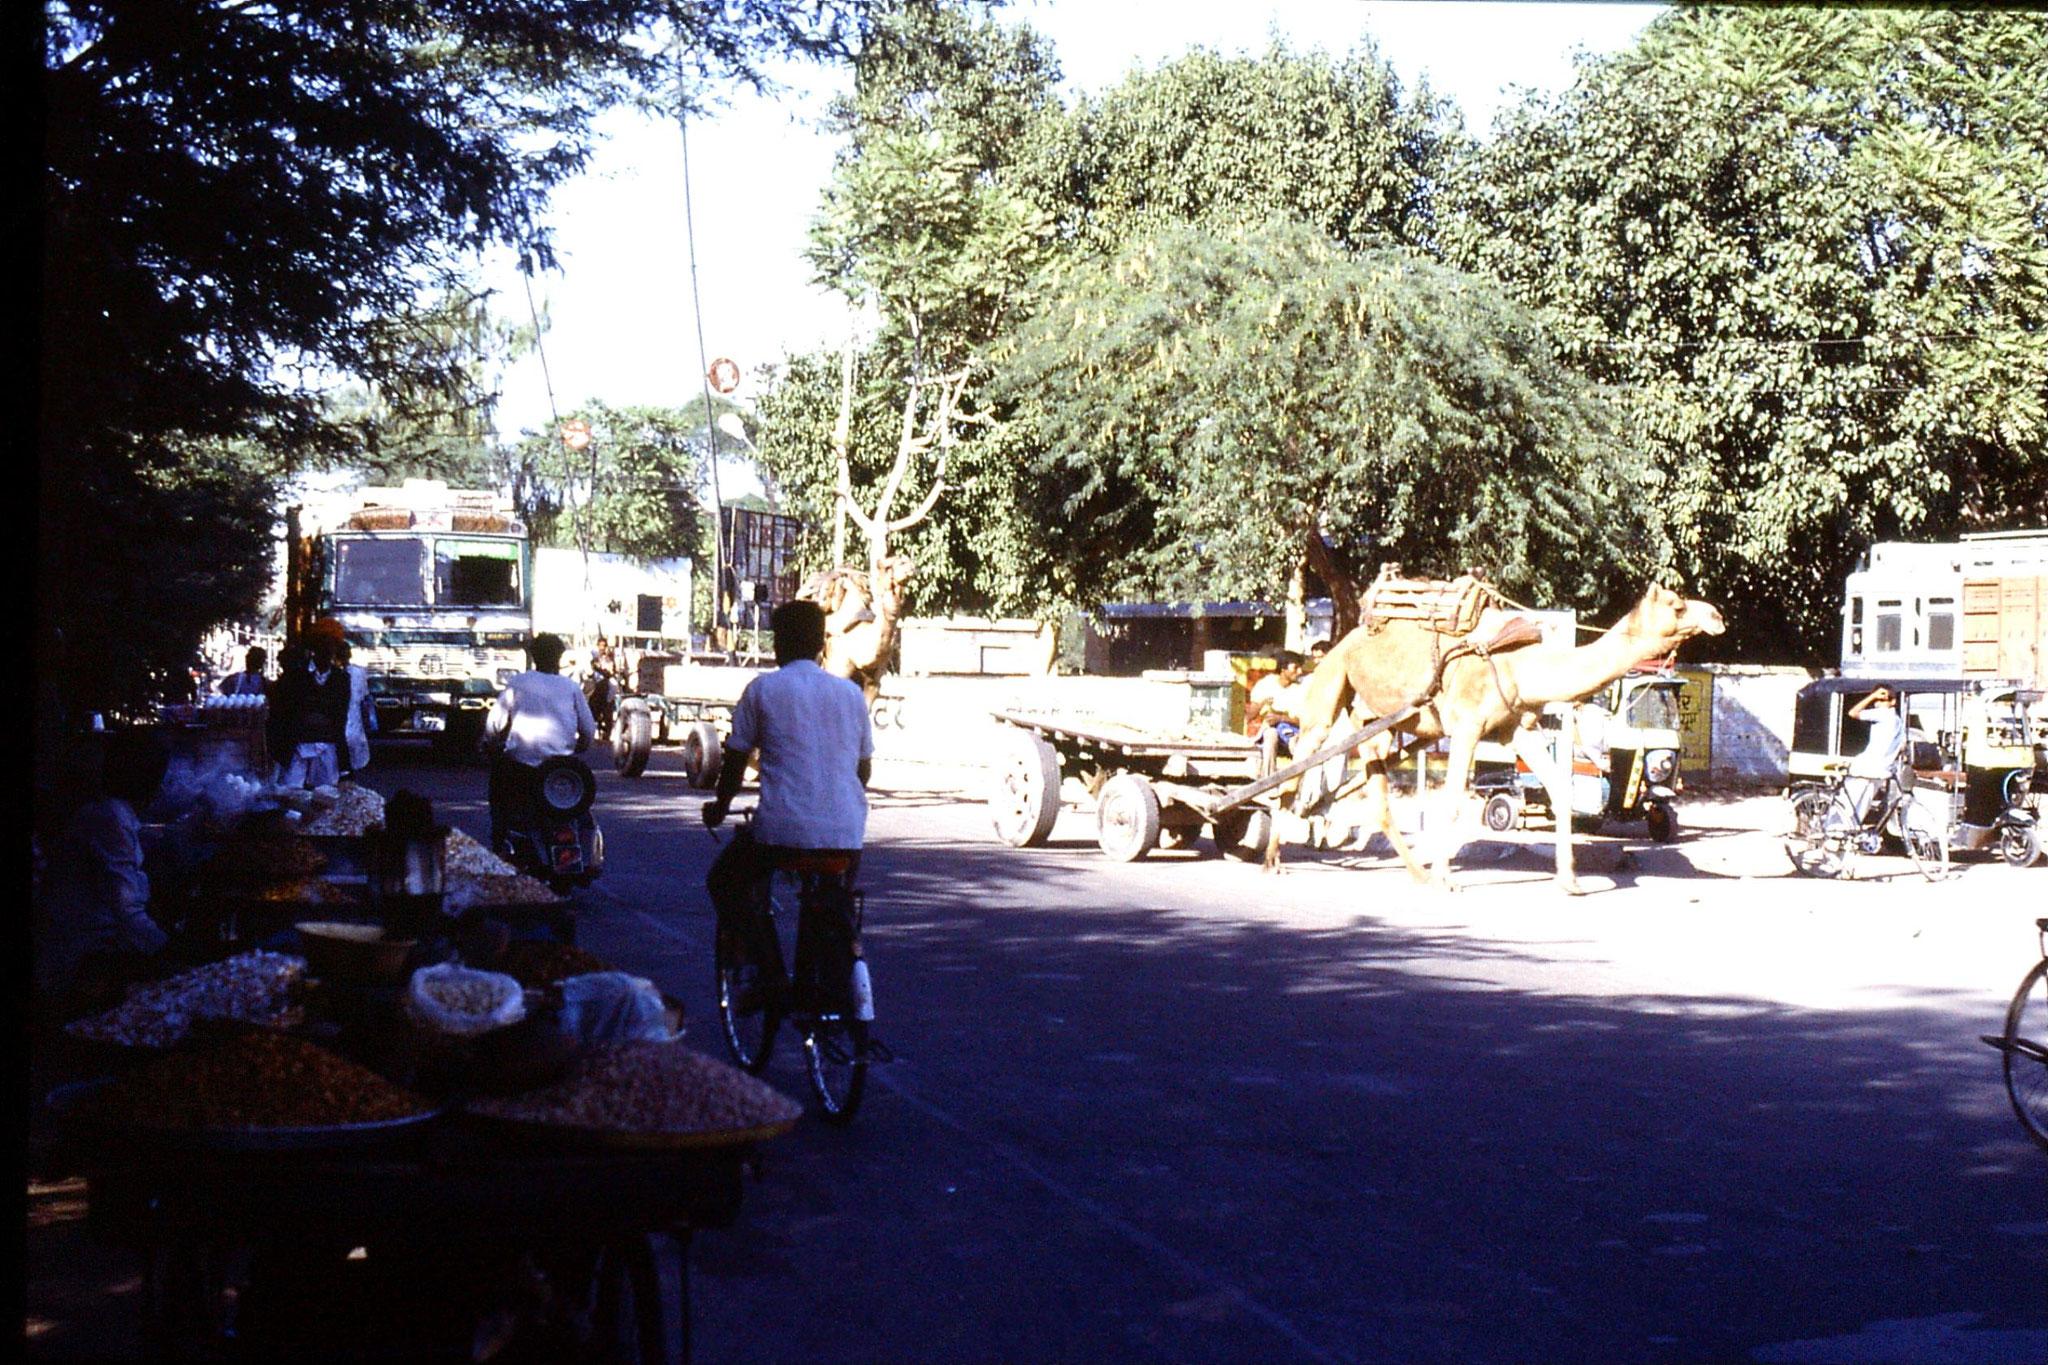 28/11/1989: 28: Jodhpur camel carts